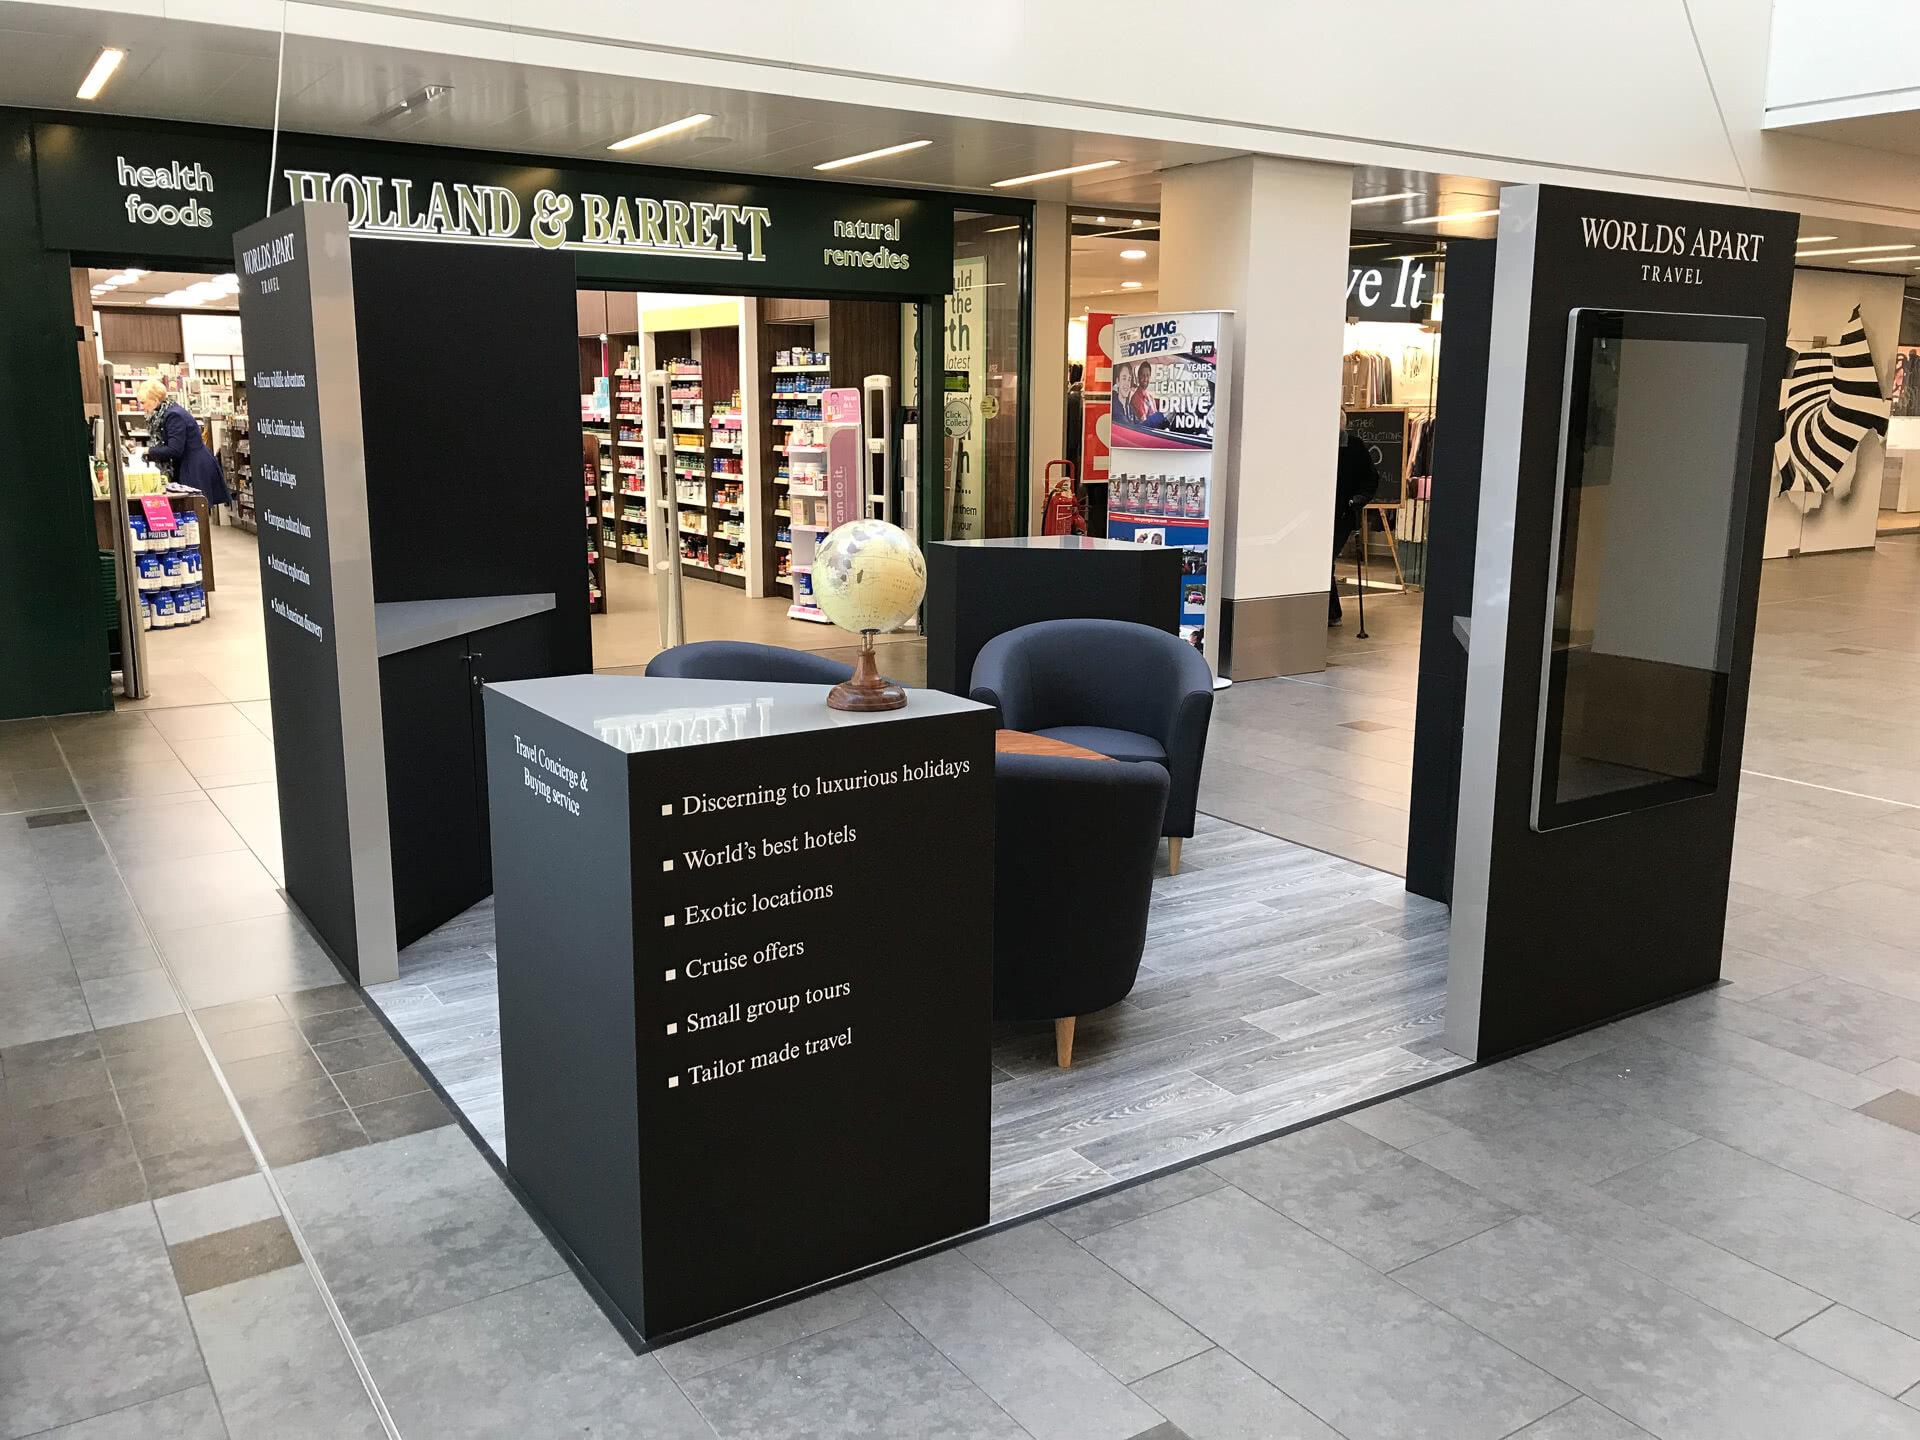 Worlds Apart Travel Kiosk Photo